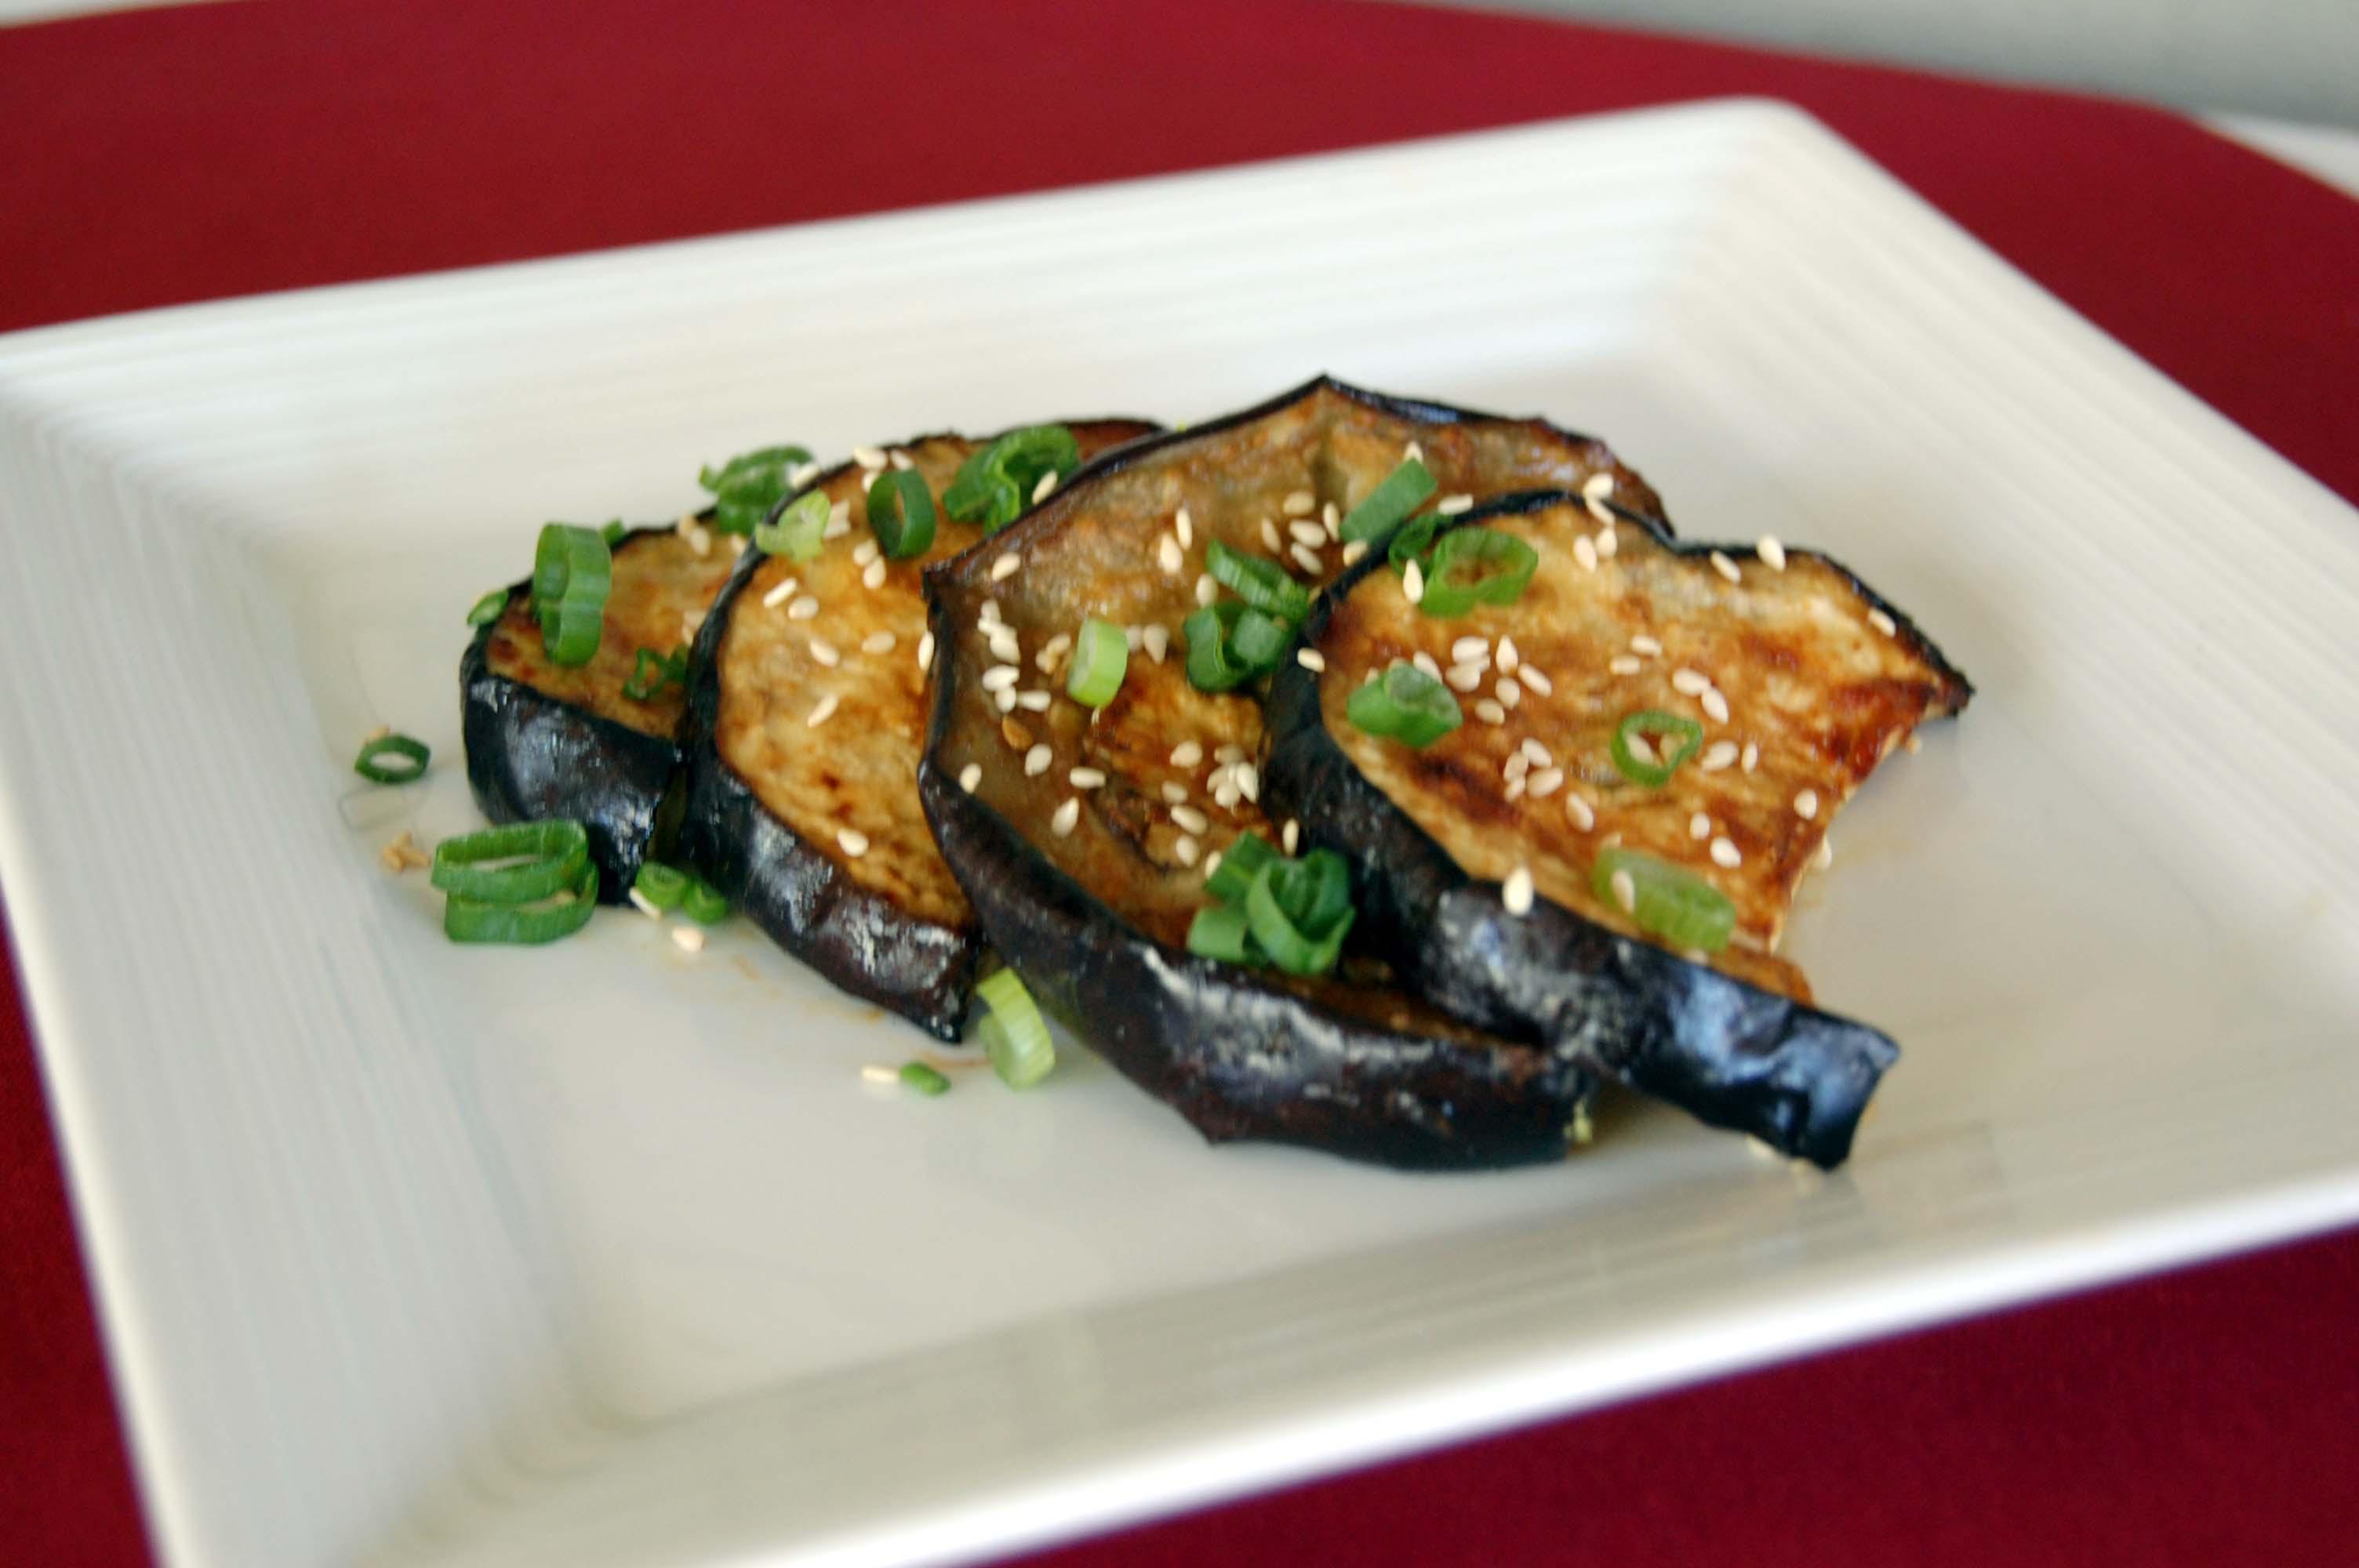 Eggplant Recipes Healthy  Healthy Recipes Asian Style Eggplant H3 Daily